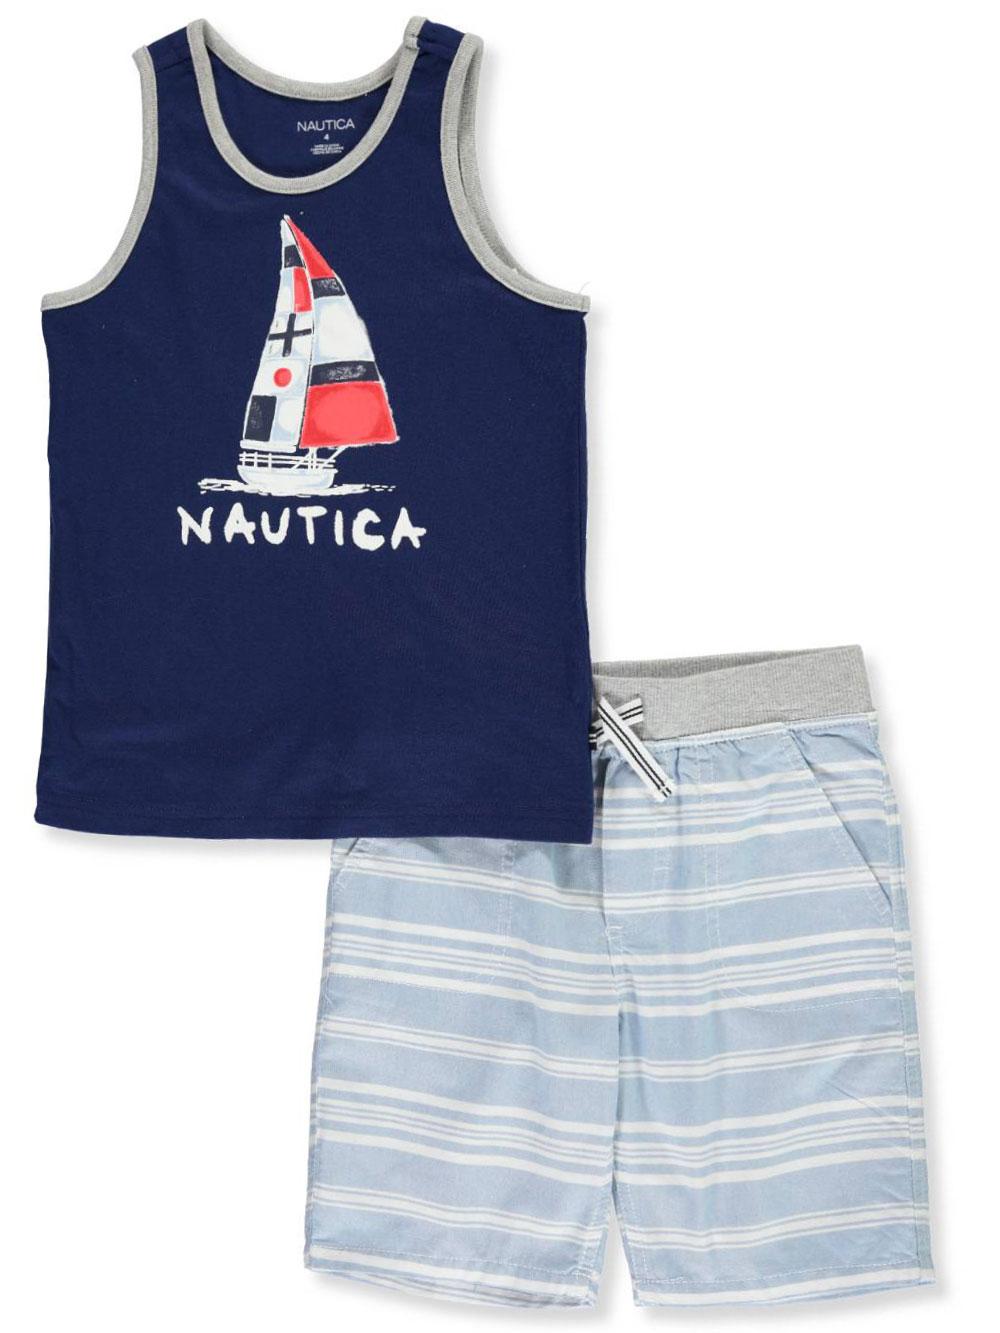 Nautica Boys/' 2-Piece Shorts Set Outfit